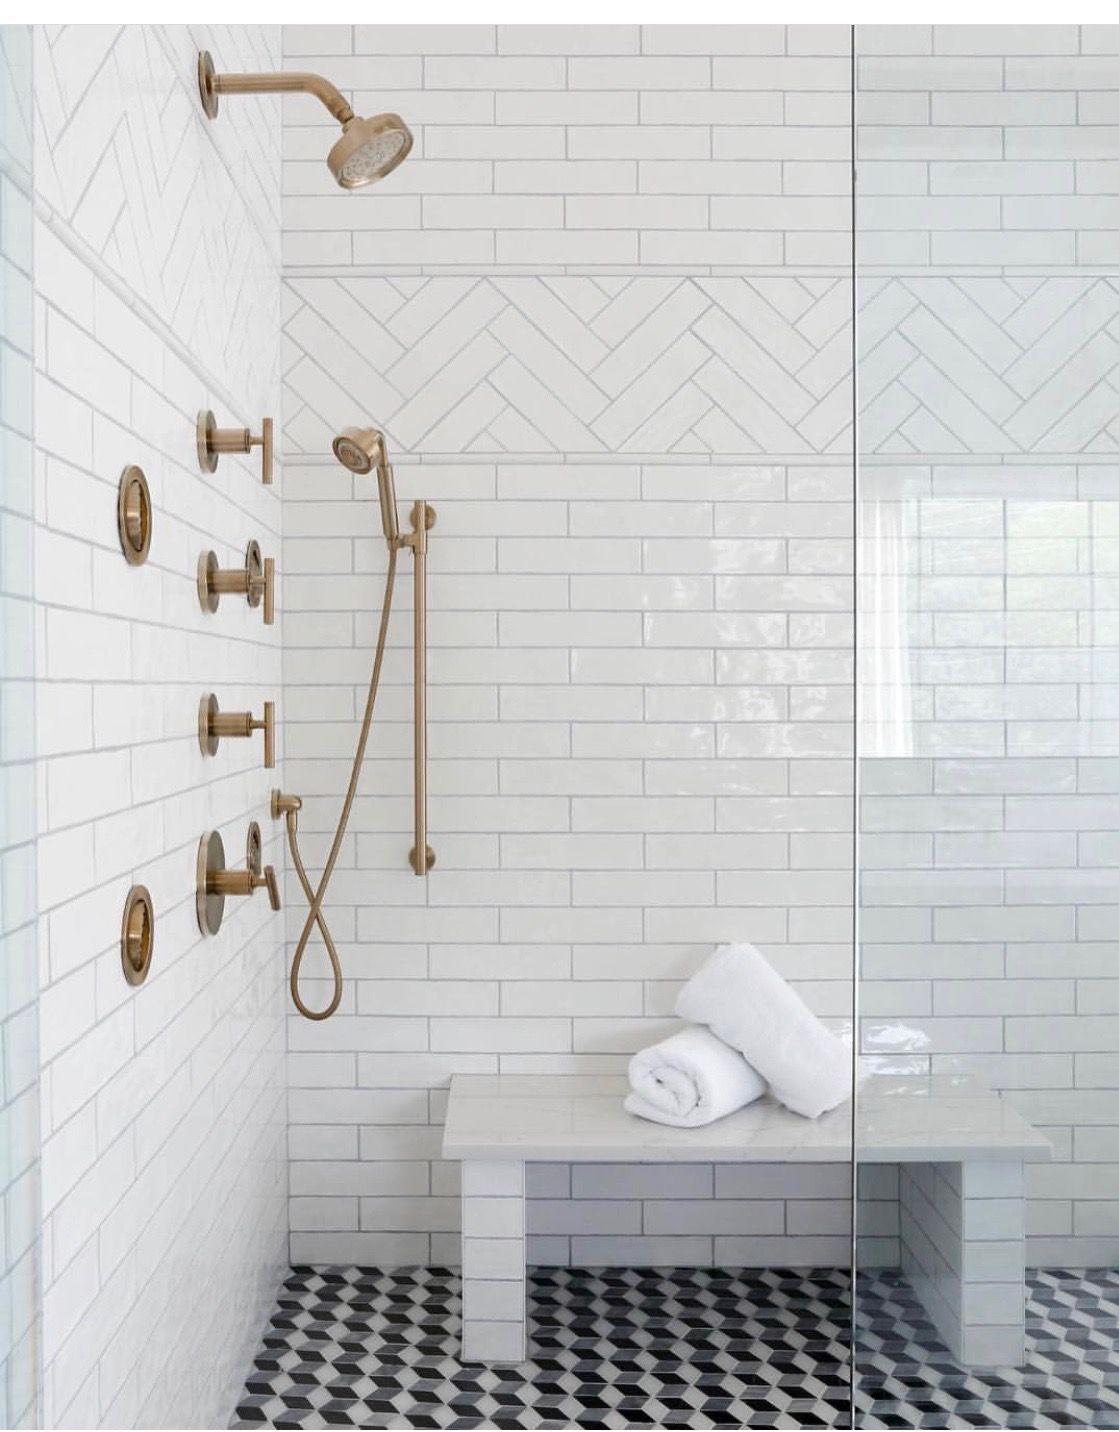 Pin By Venu Bhakhri On Bathroom With Images Beautiful Bathroom